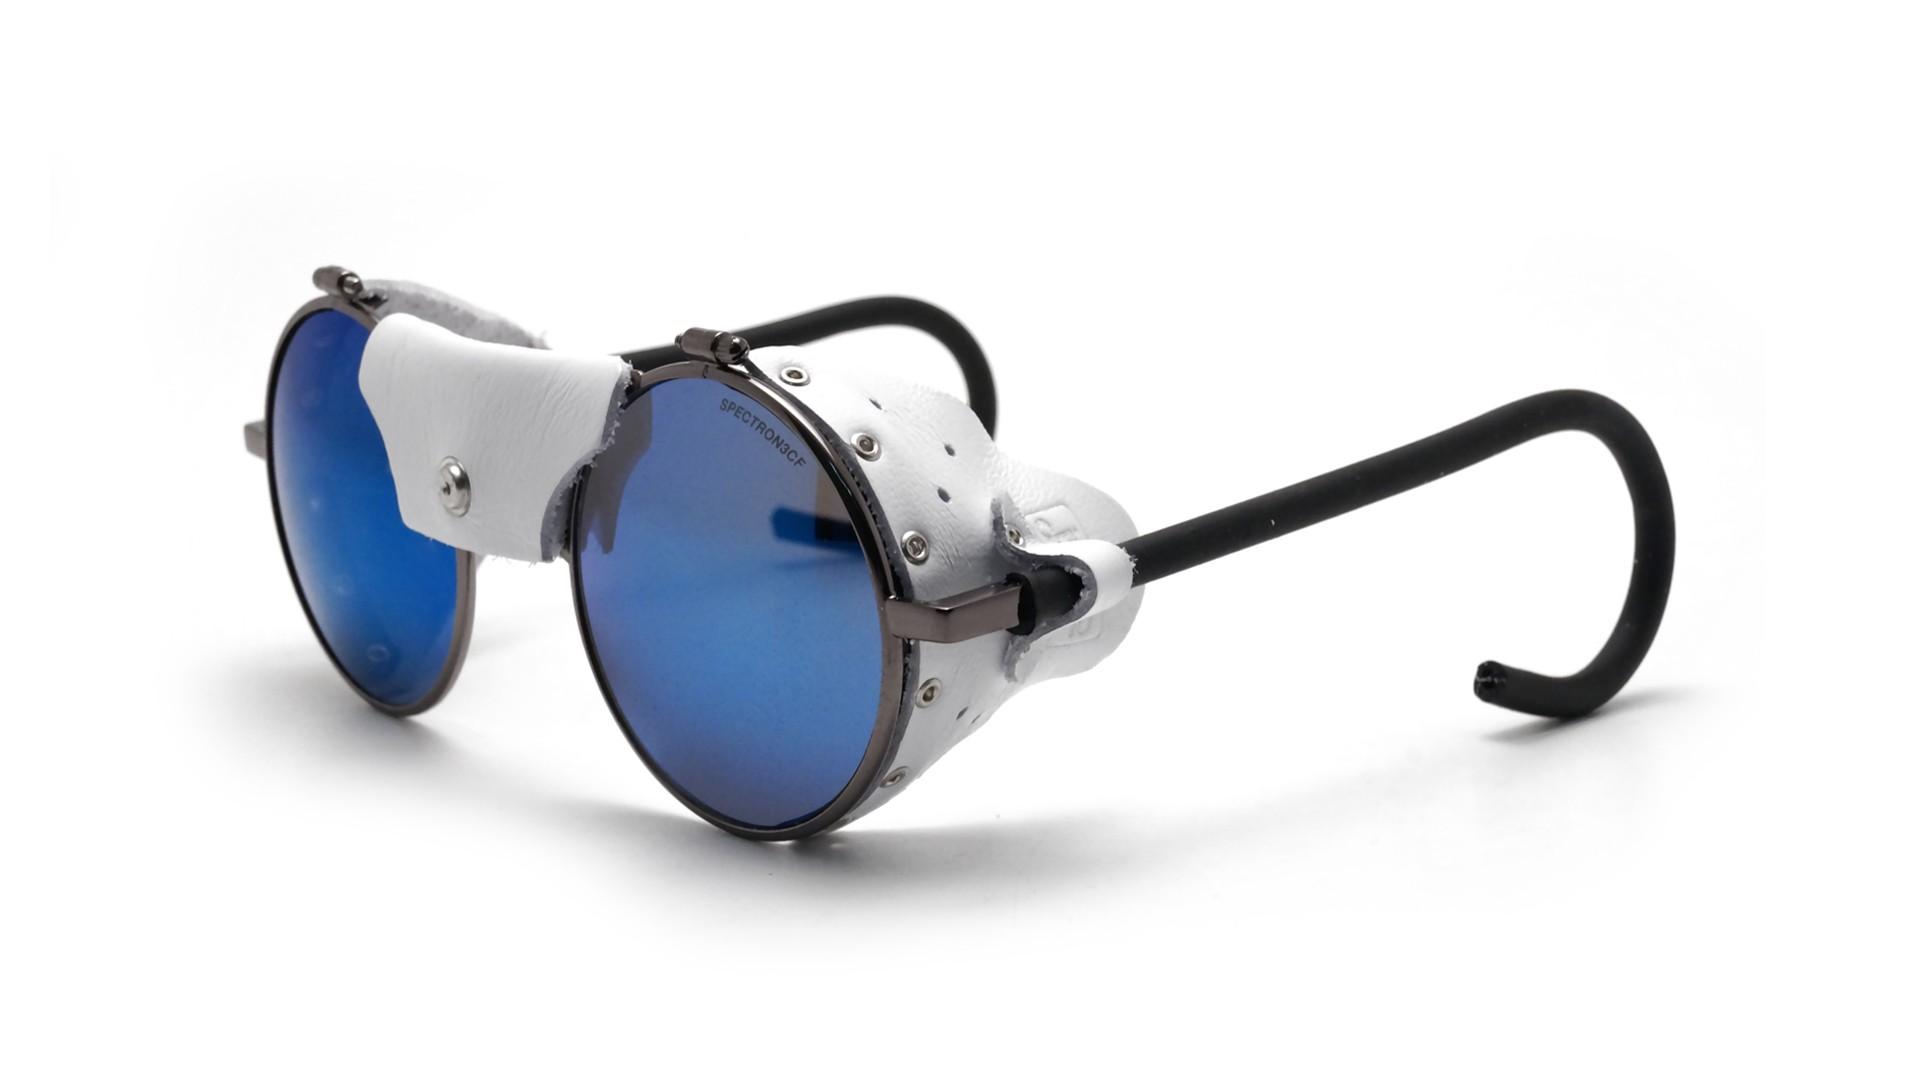 Sunglasses Julbo Vermont Classic Gun Silver J010 11 21 white leather shell  Blue Lenses 51-23 Medium Flash 0b49e1e913bd